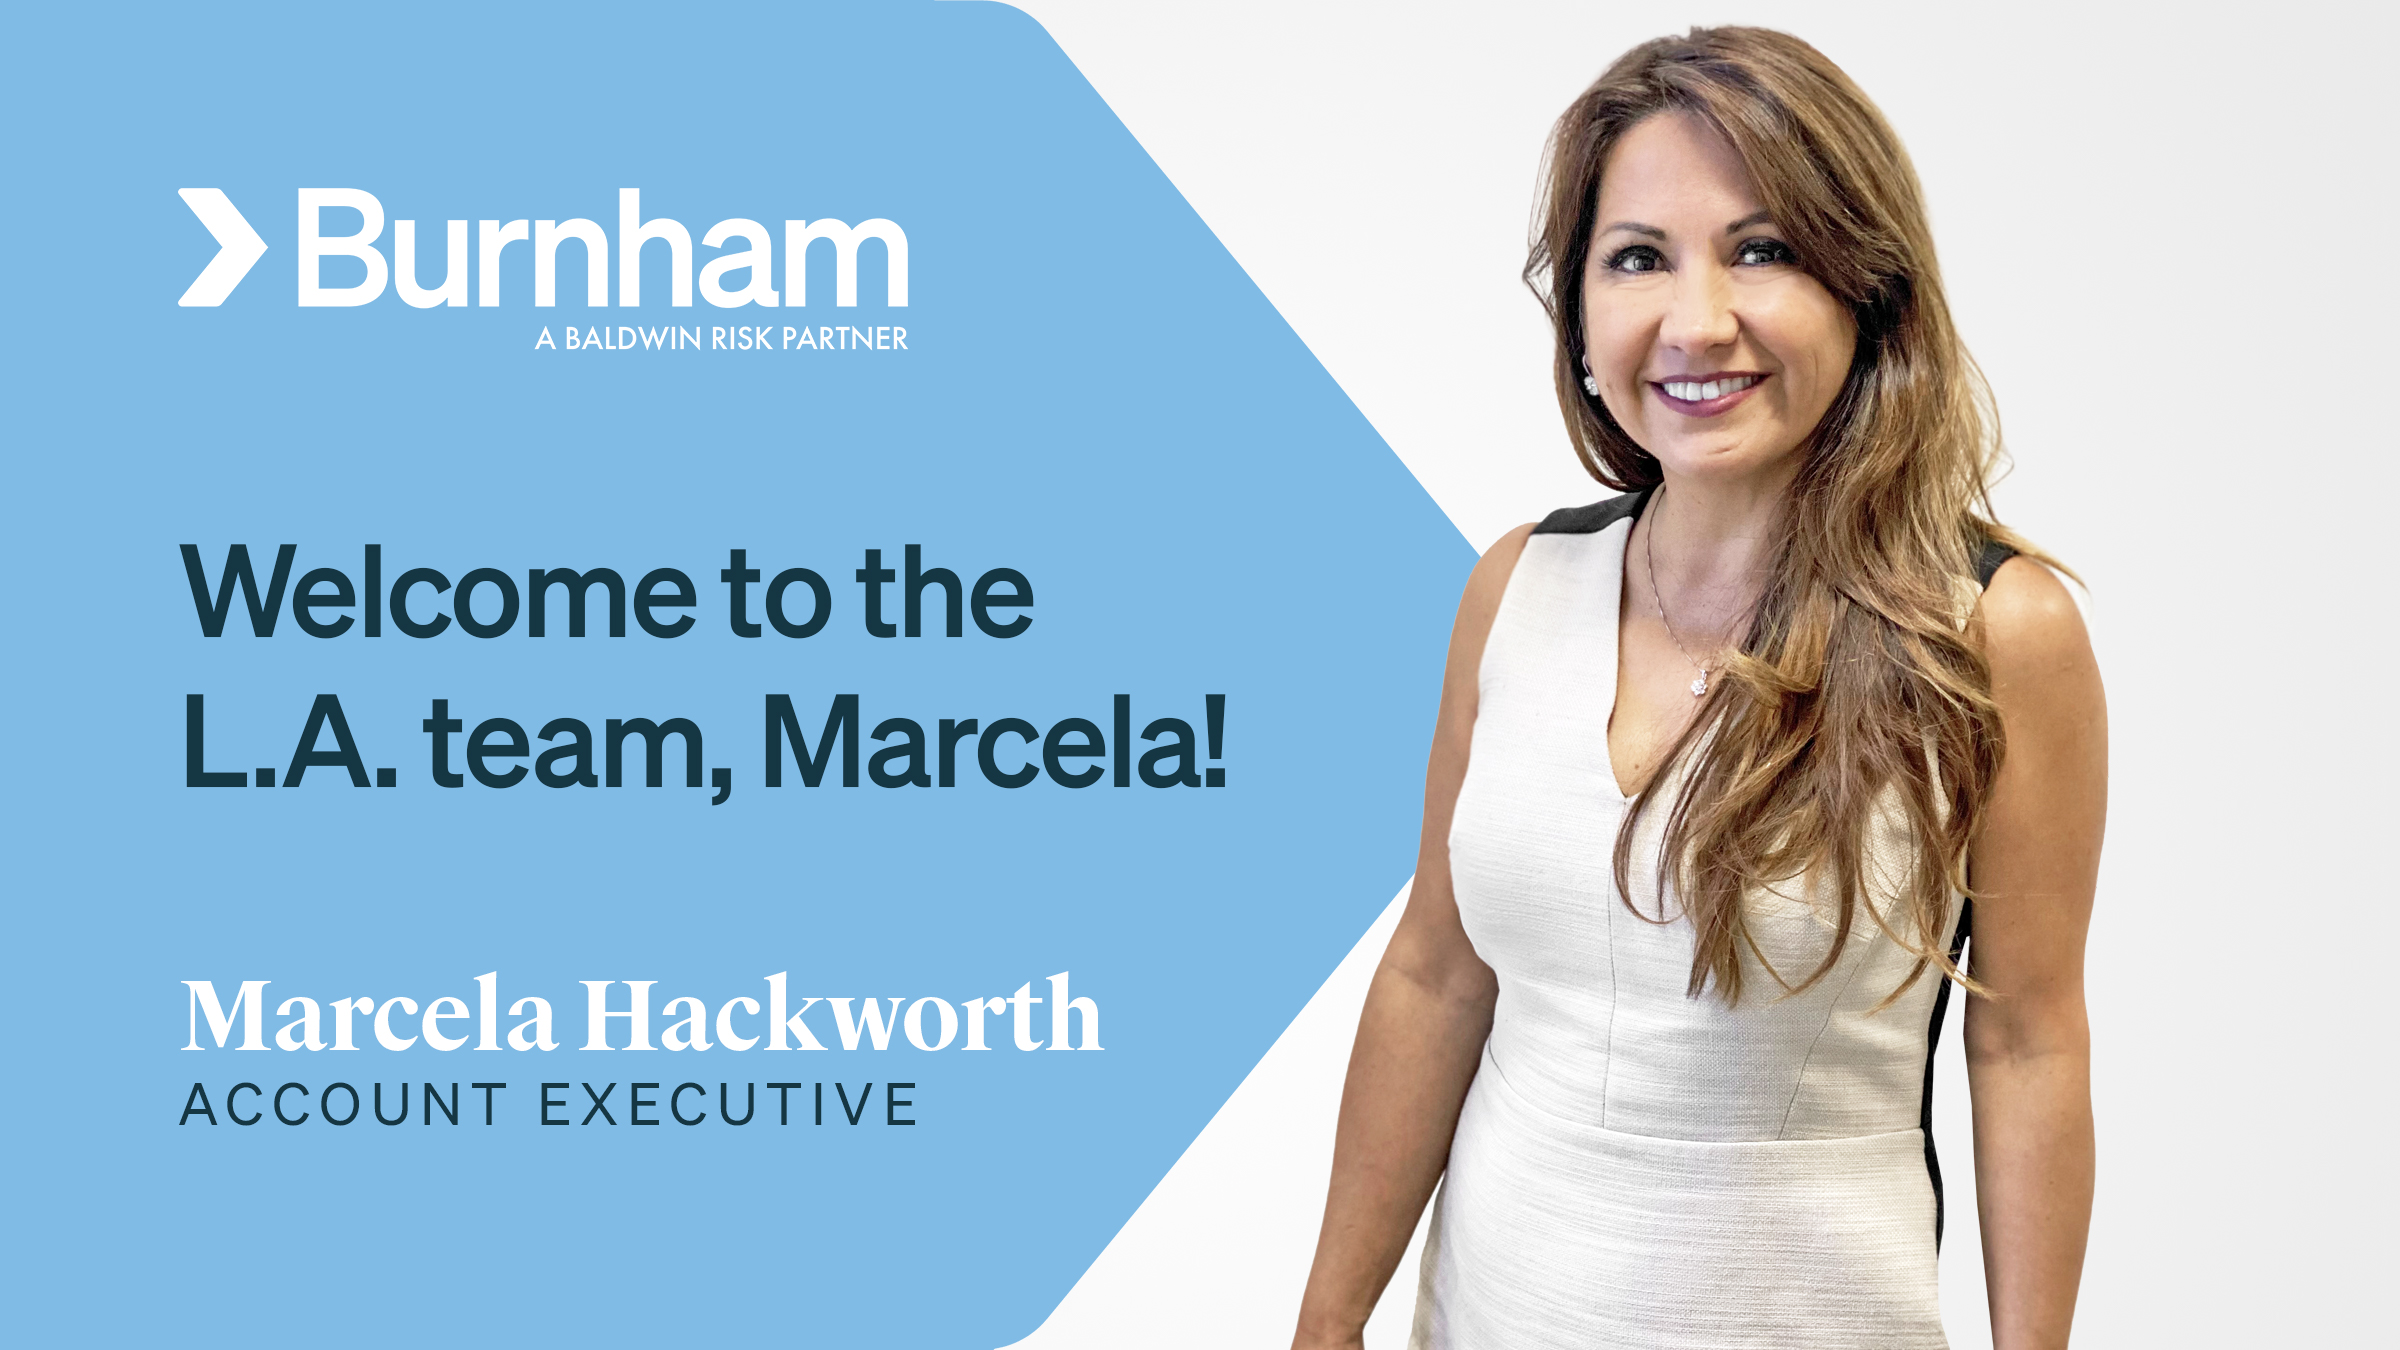 Marcela Hackworth